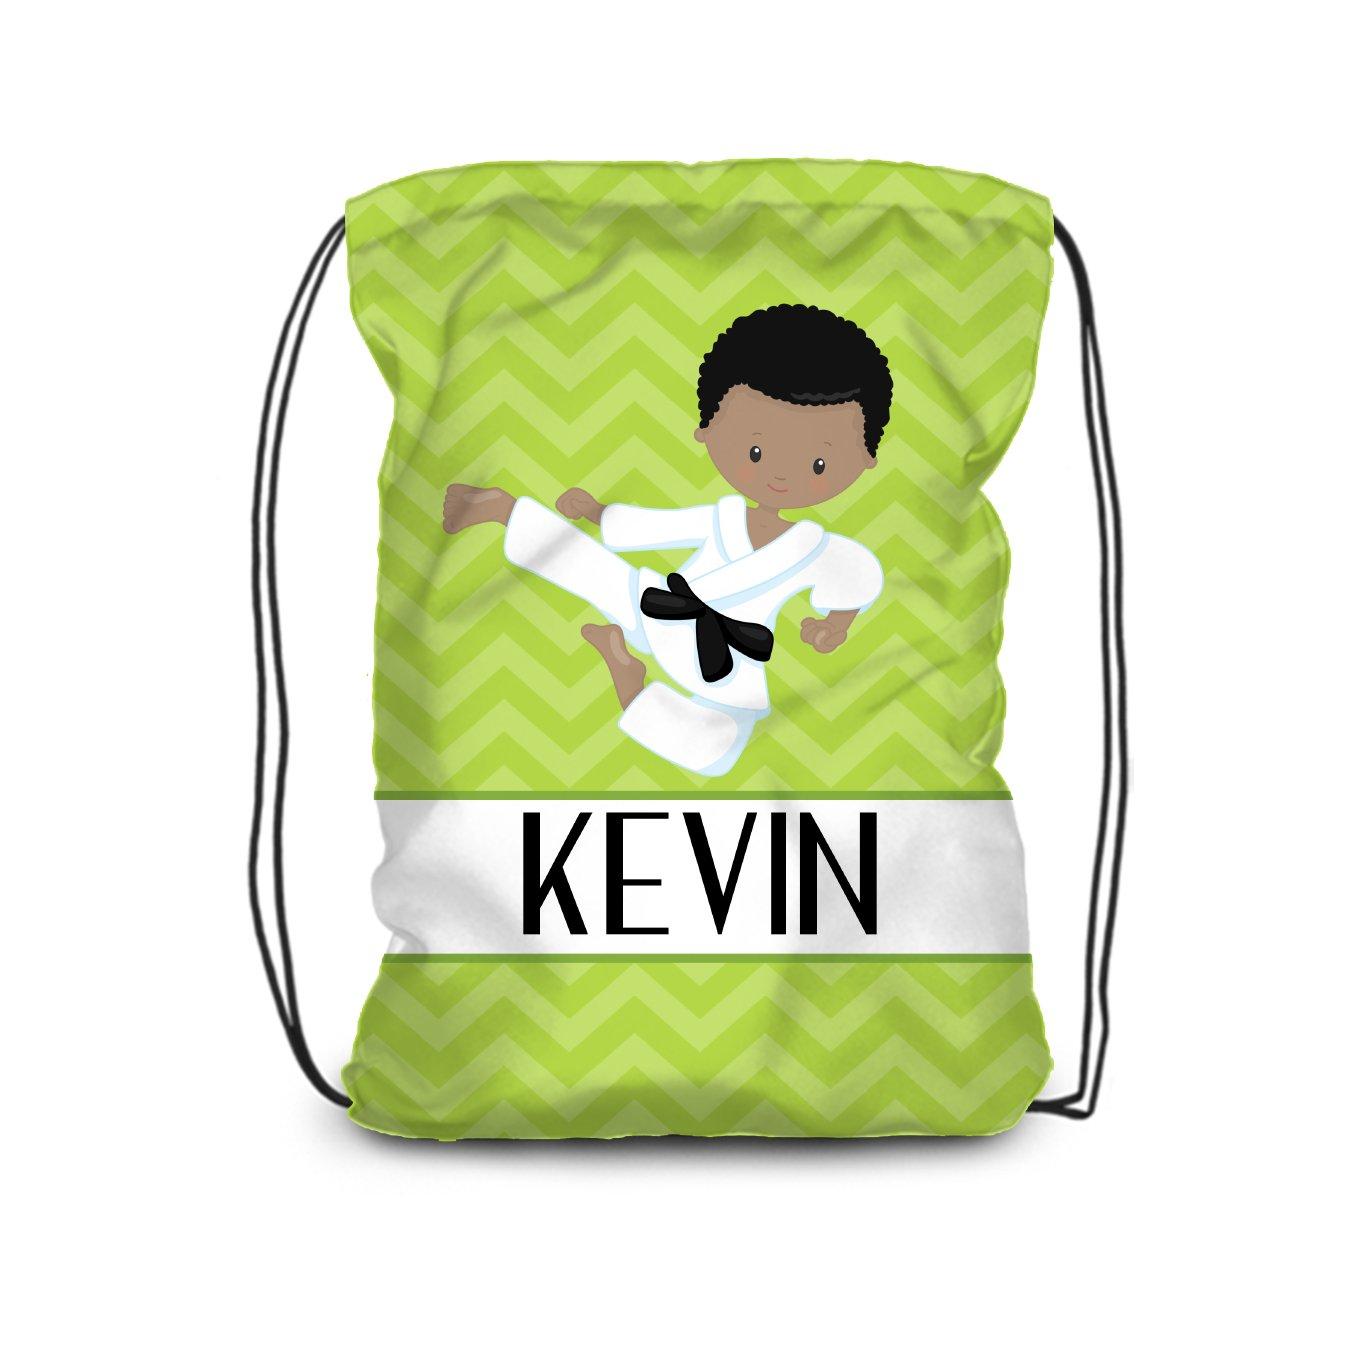 Karate Drawstring Backpack - Lime Karate Boy Personalized Name Bag